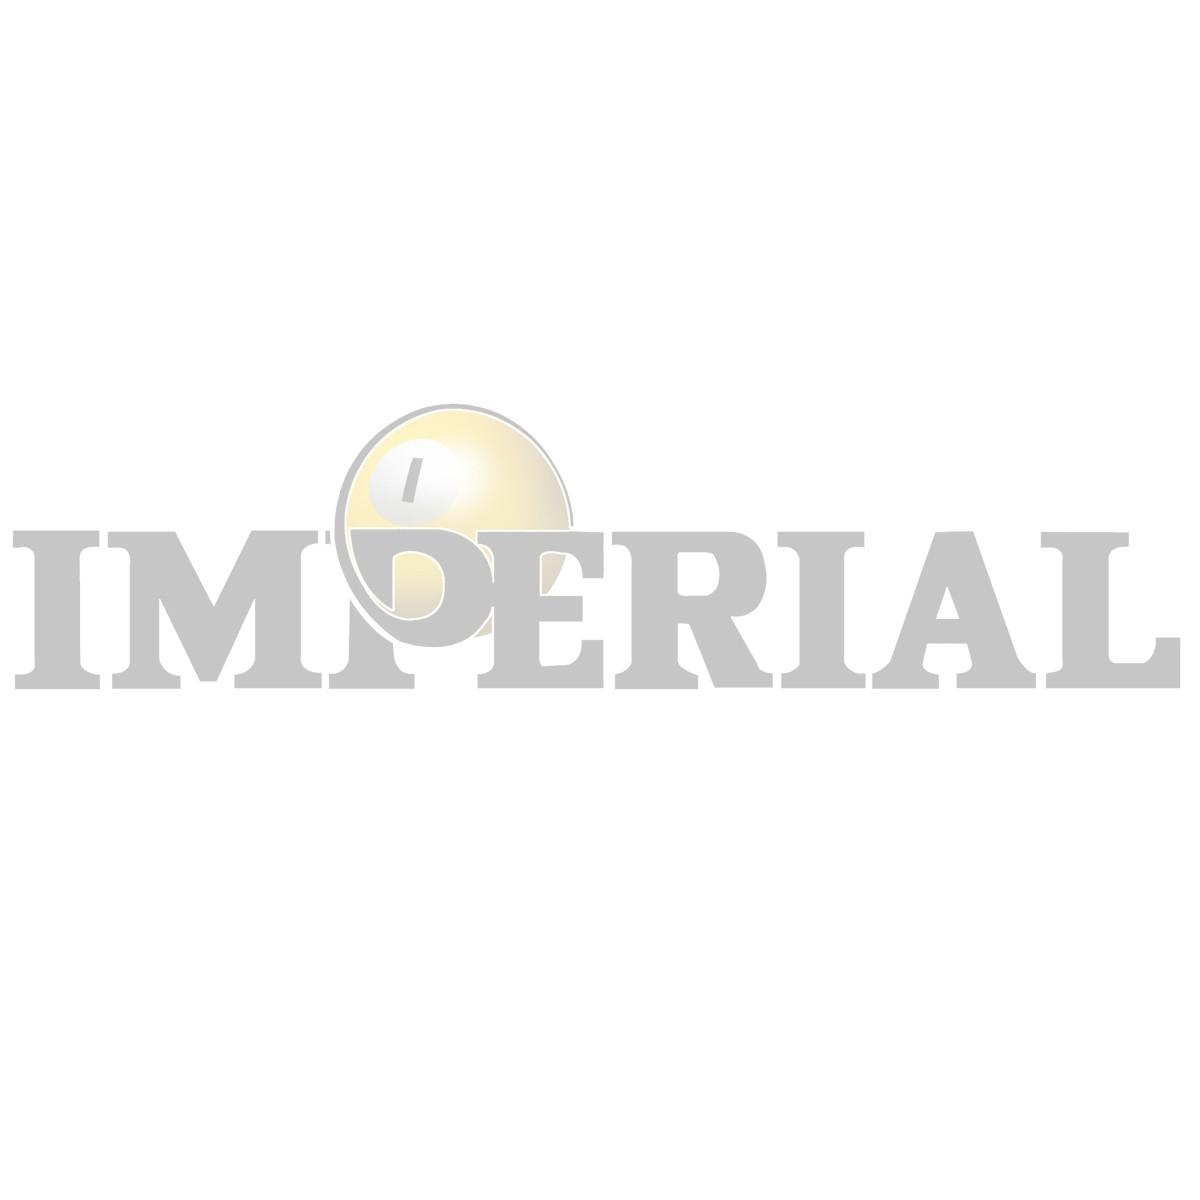 UNIVERSITY OF WISCONSIN PUB CAPTAINS CHAIR, WHITE